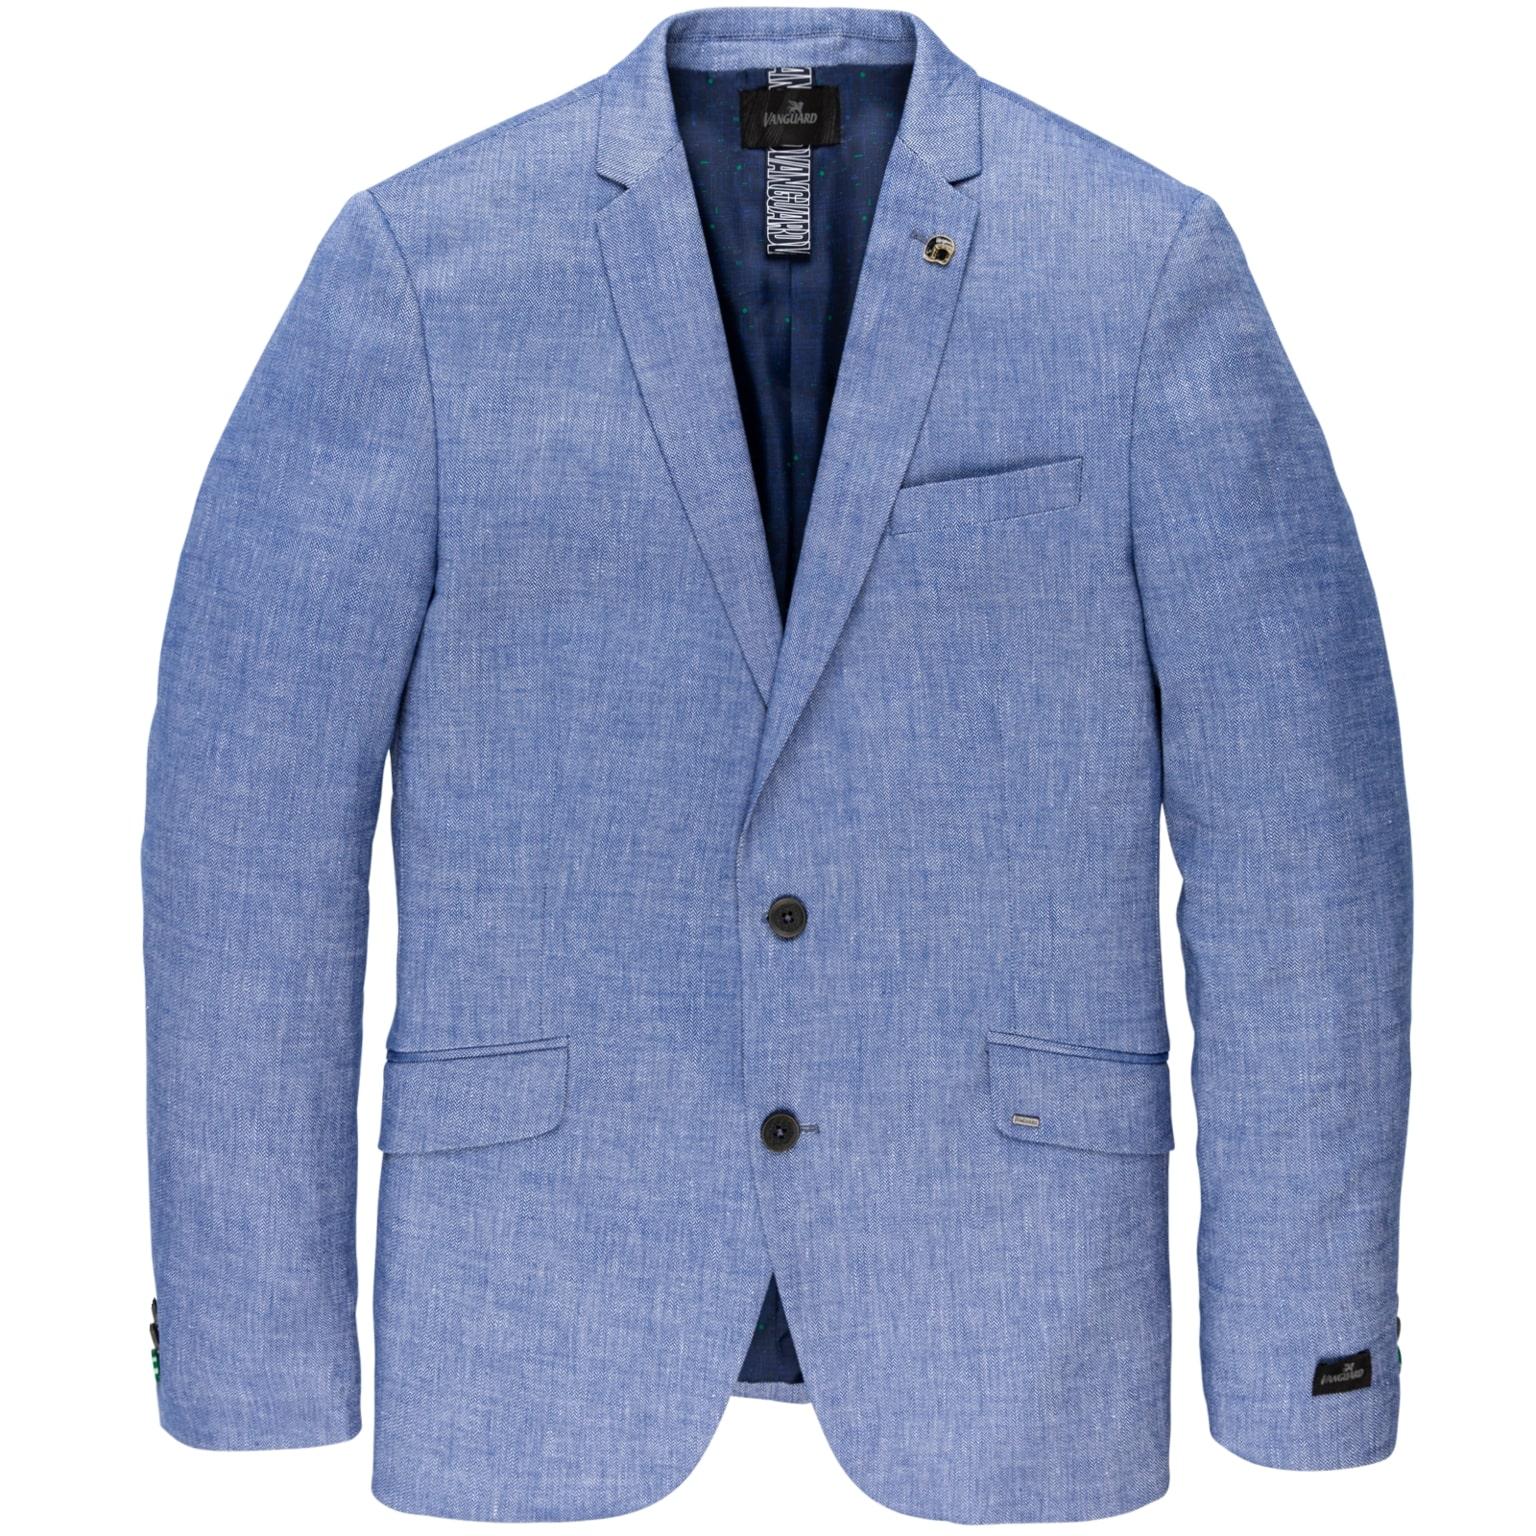 Blauwe heren blazer - VBL202163 5302